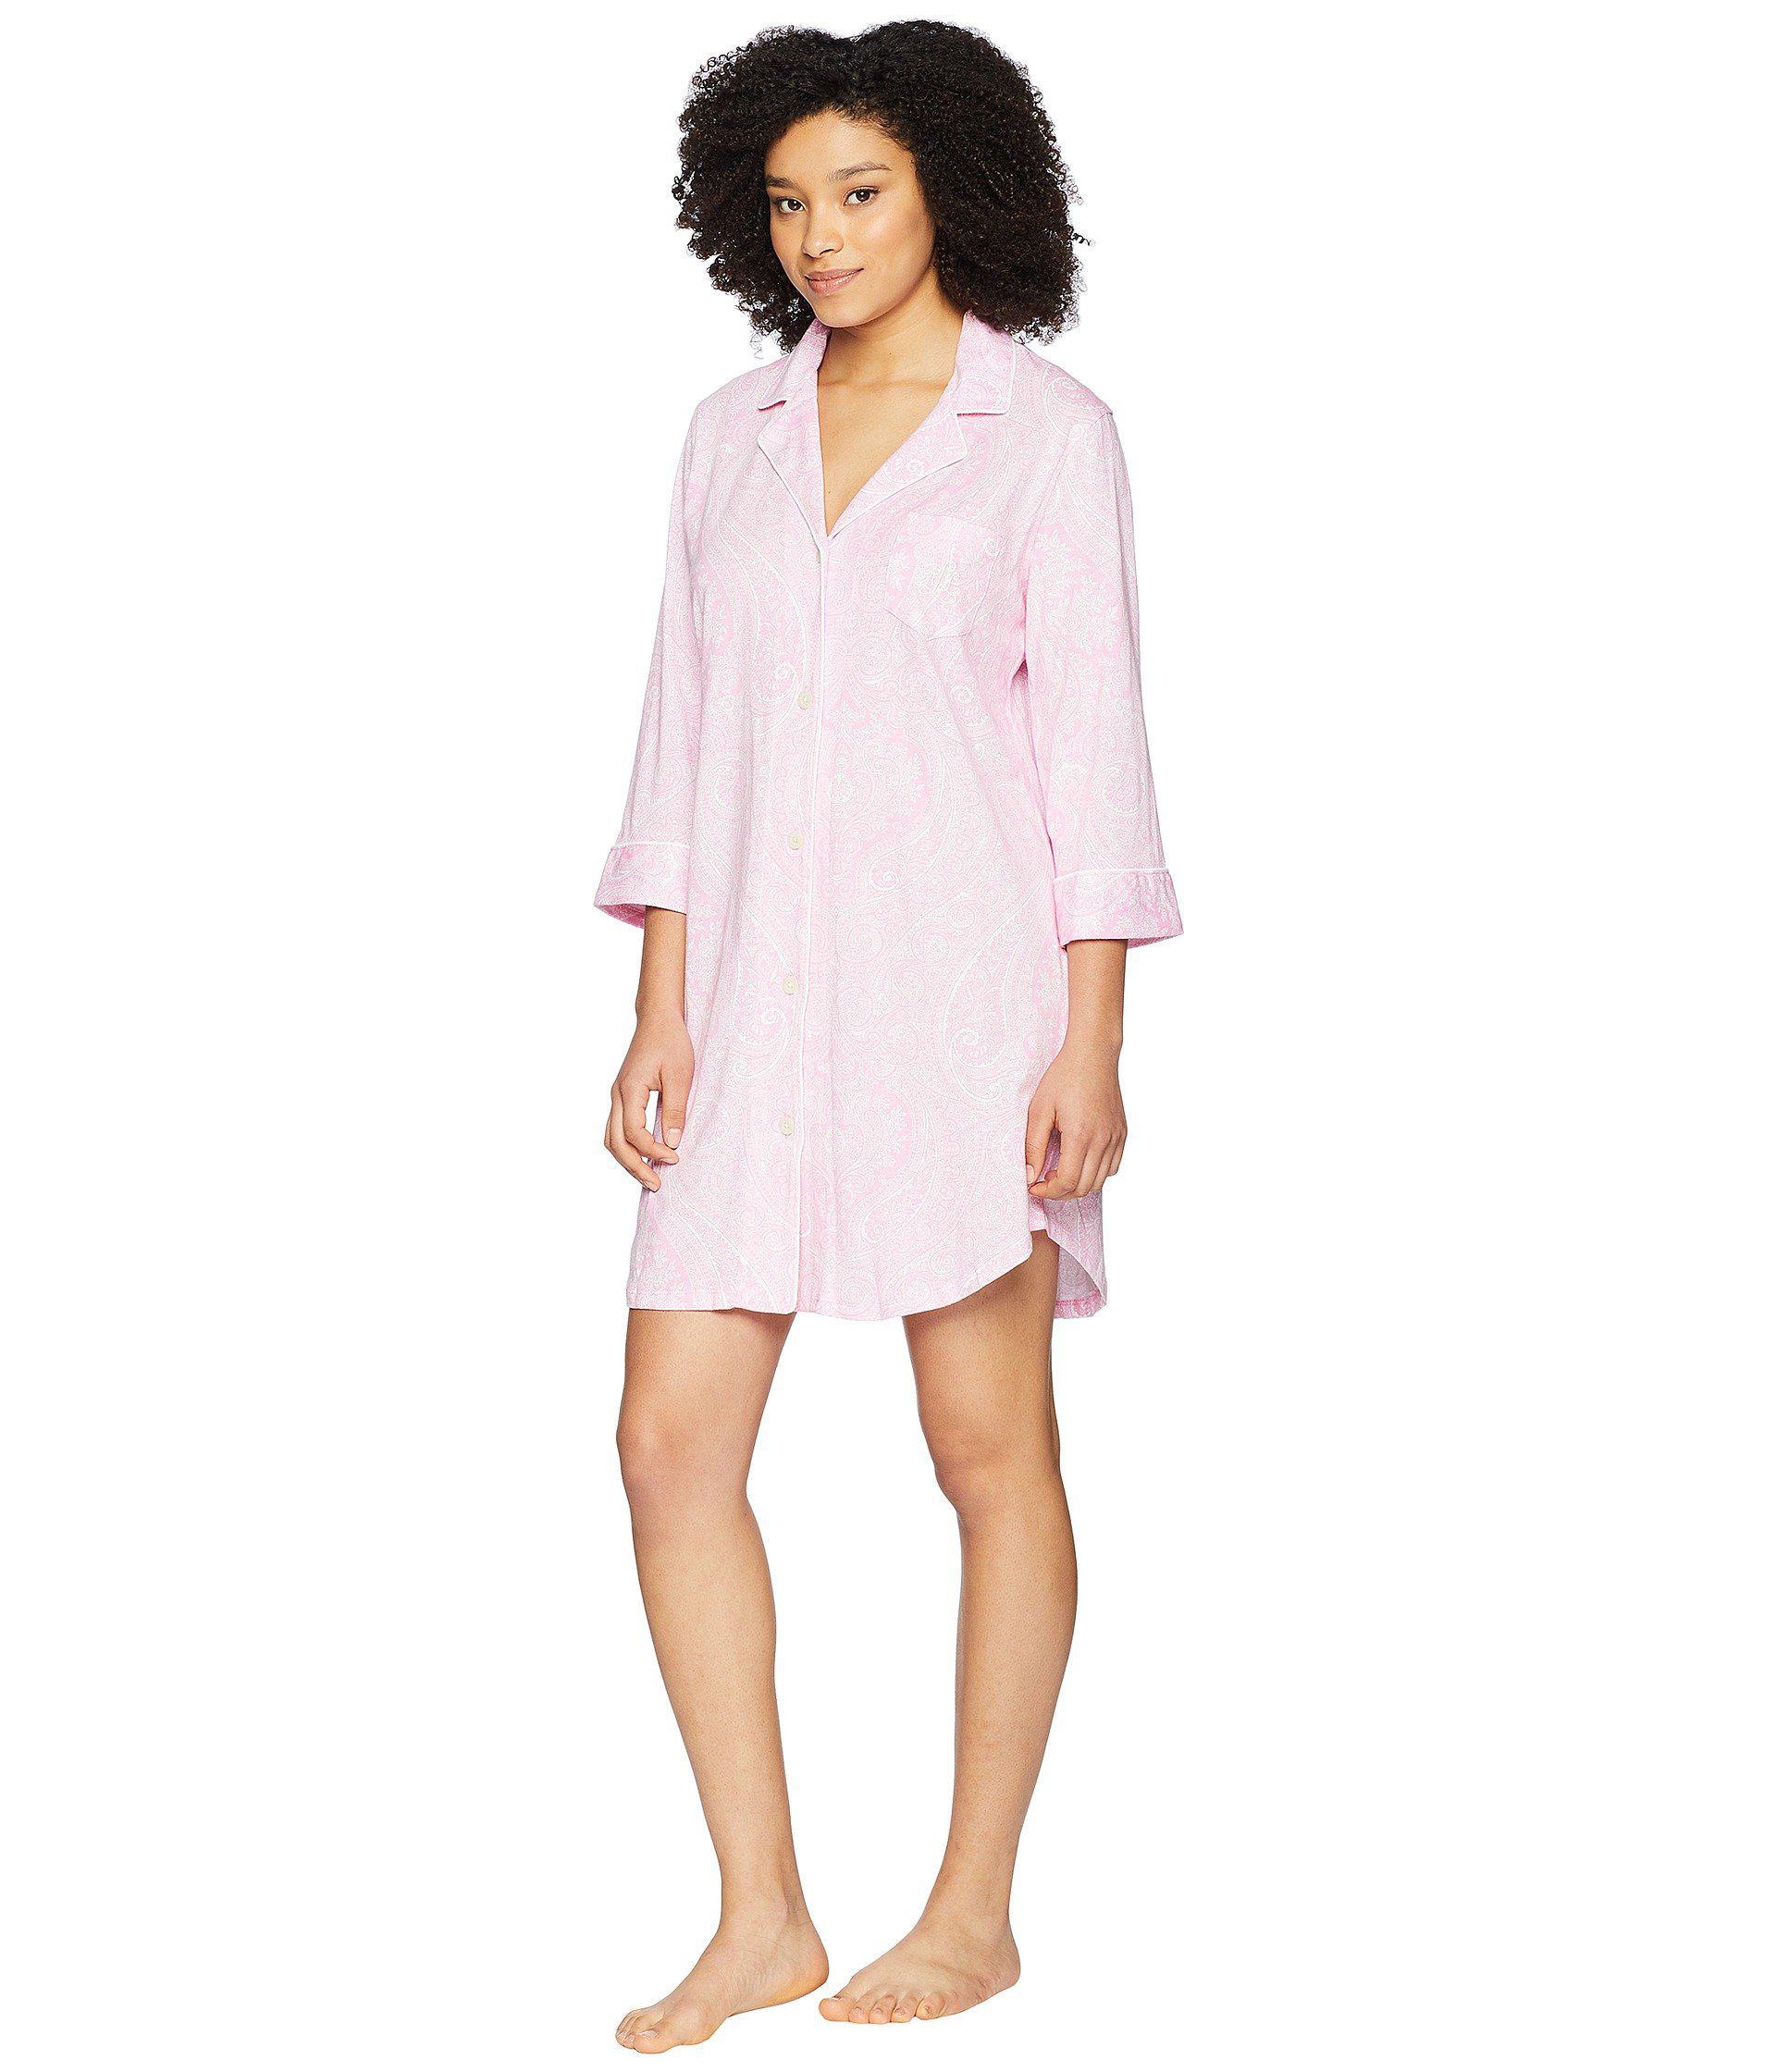 54eb6b7acb Lauren by Ralph Lauren - Essentials Bingham Knits Sleep Shirt (pink  Paisley) Women s Pajama. View fullscreen